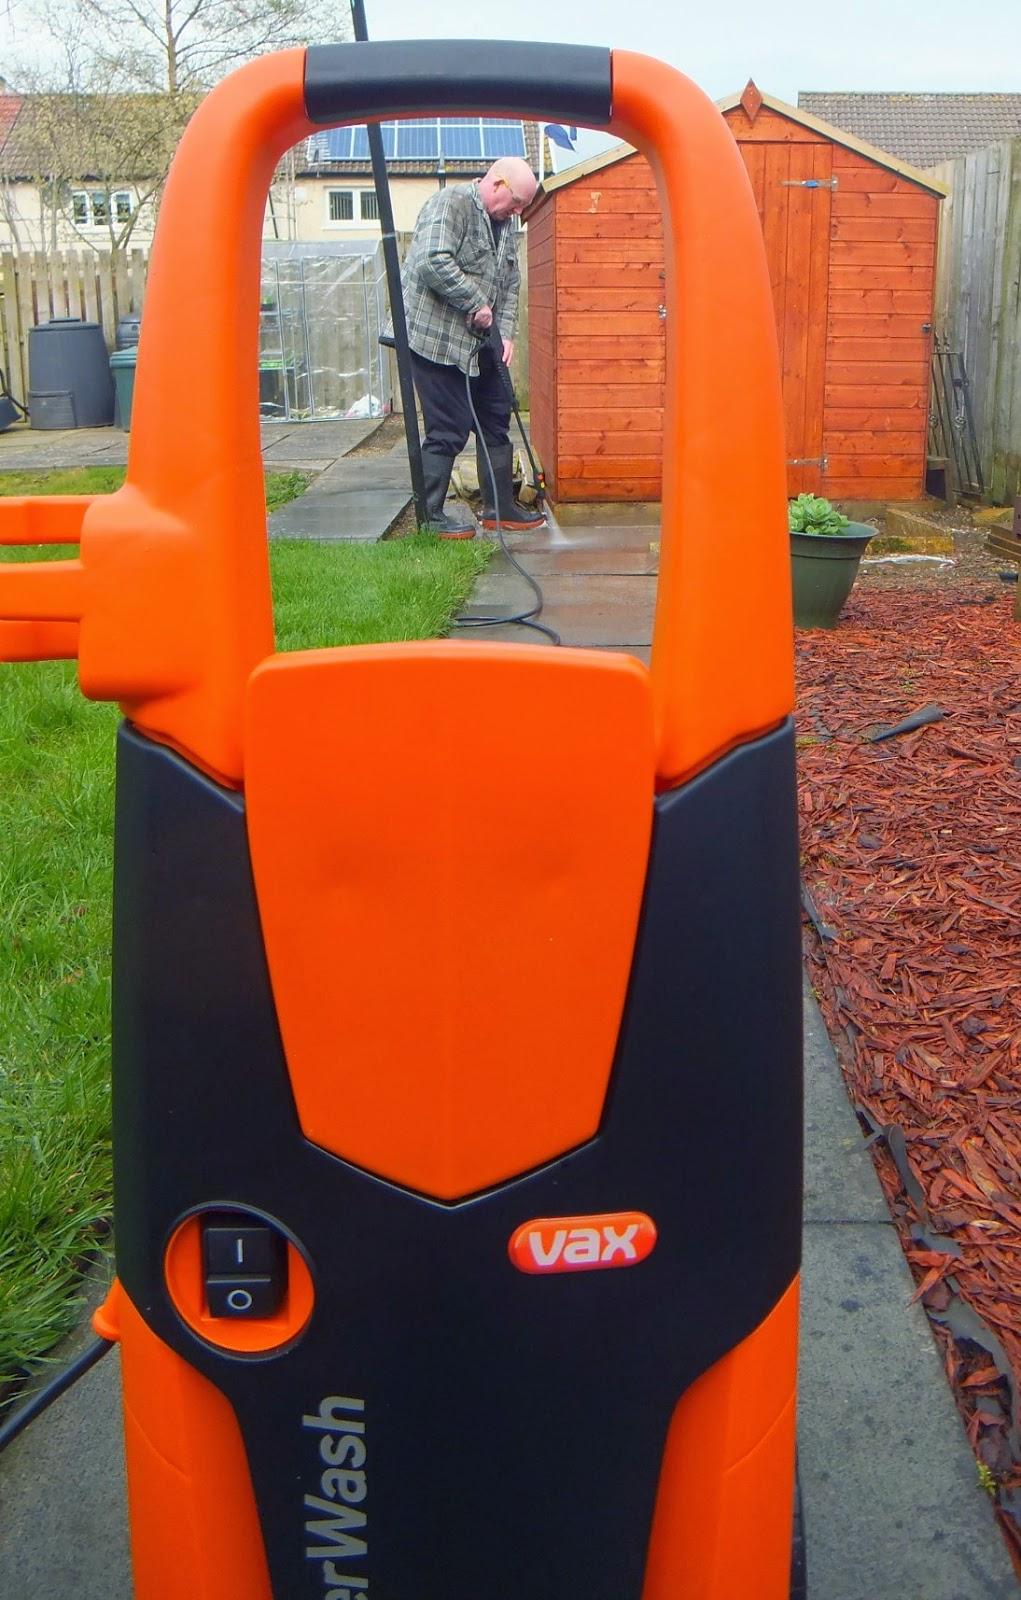 Fun As A Gran Vax Pressure Washer 2200w A Review